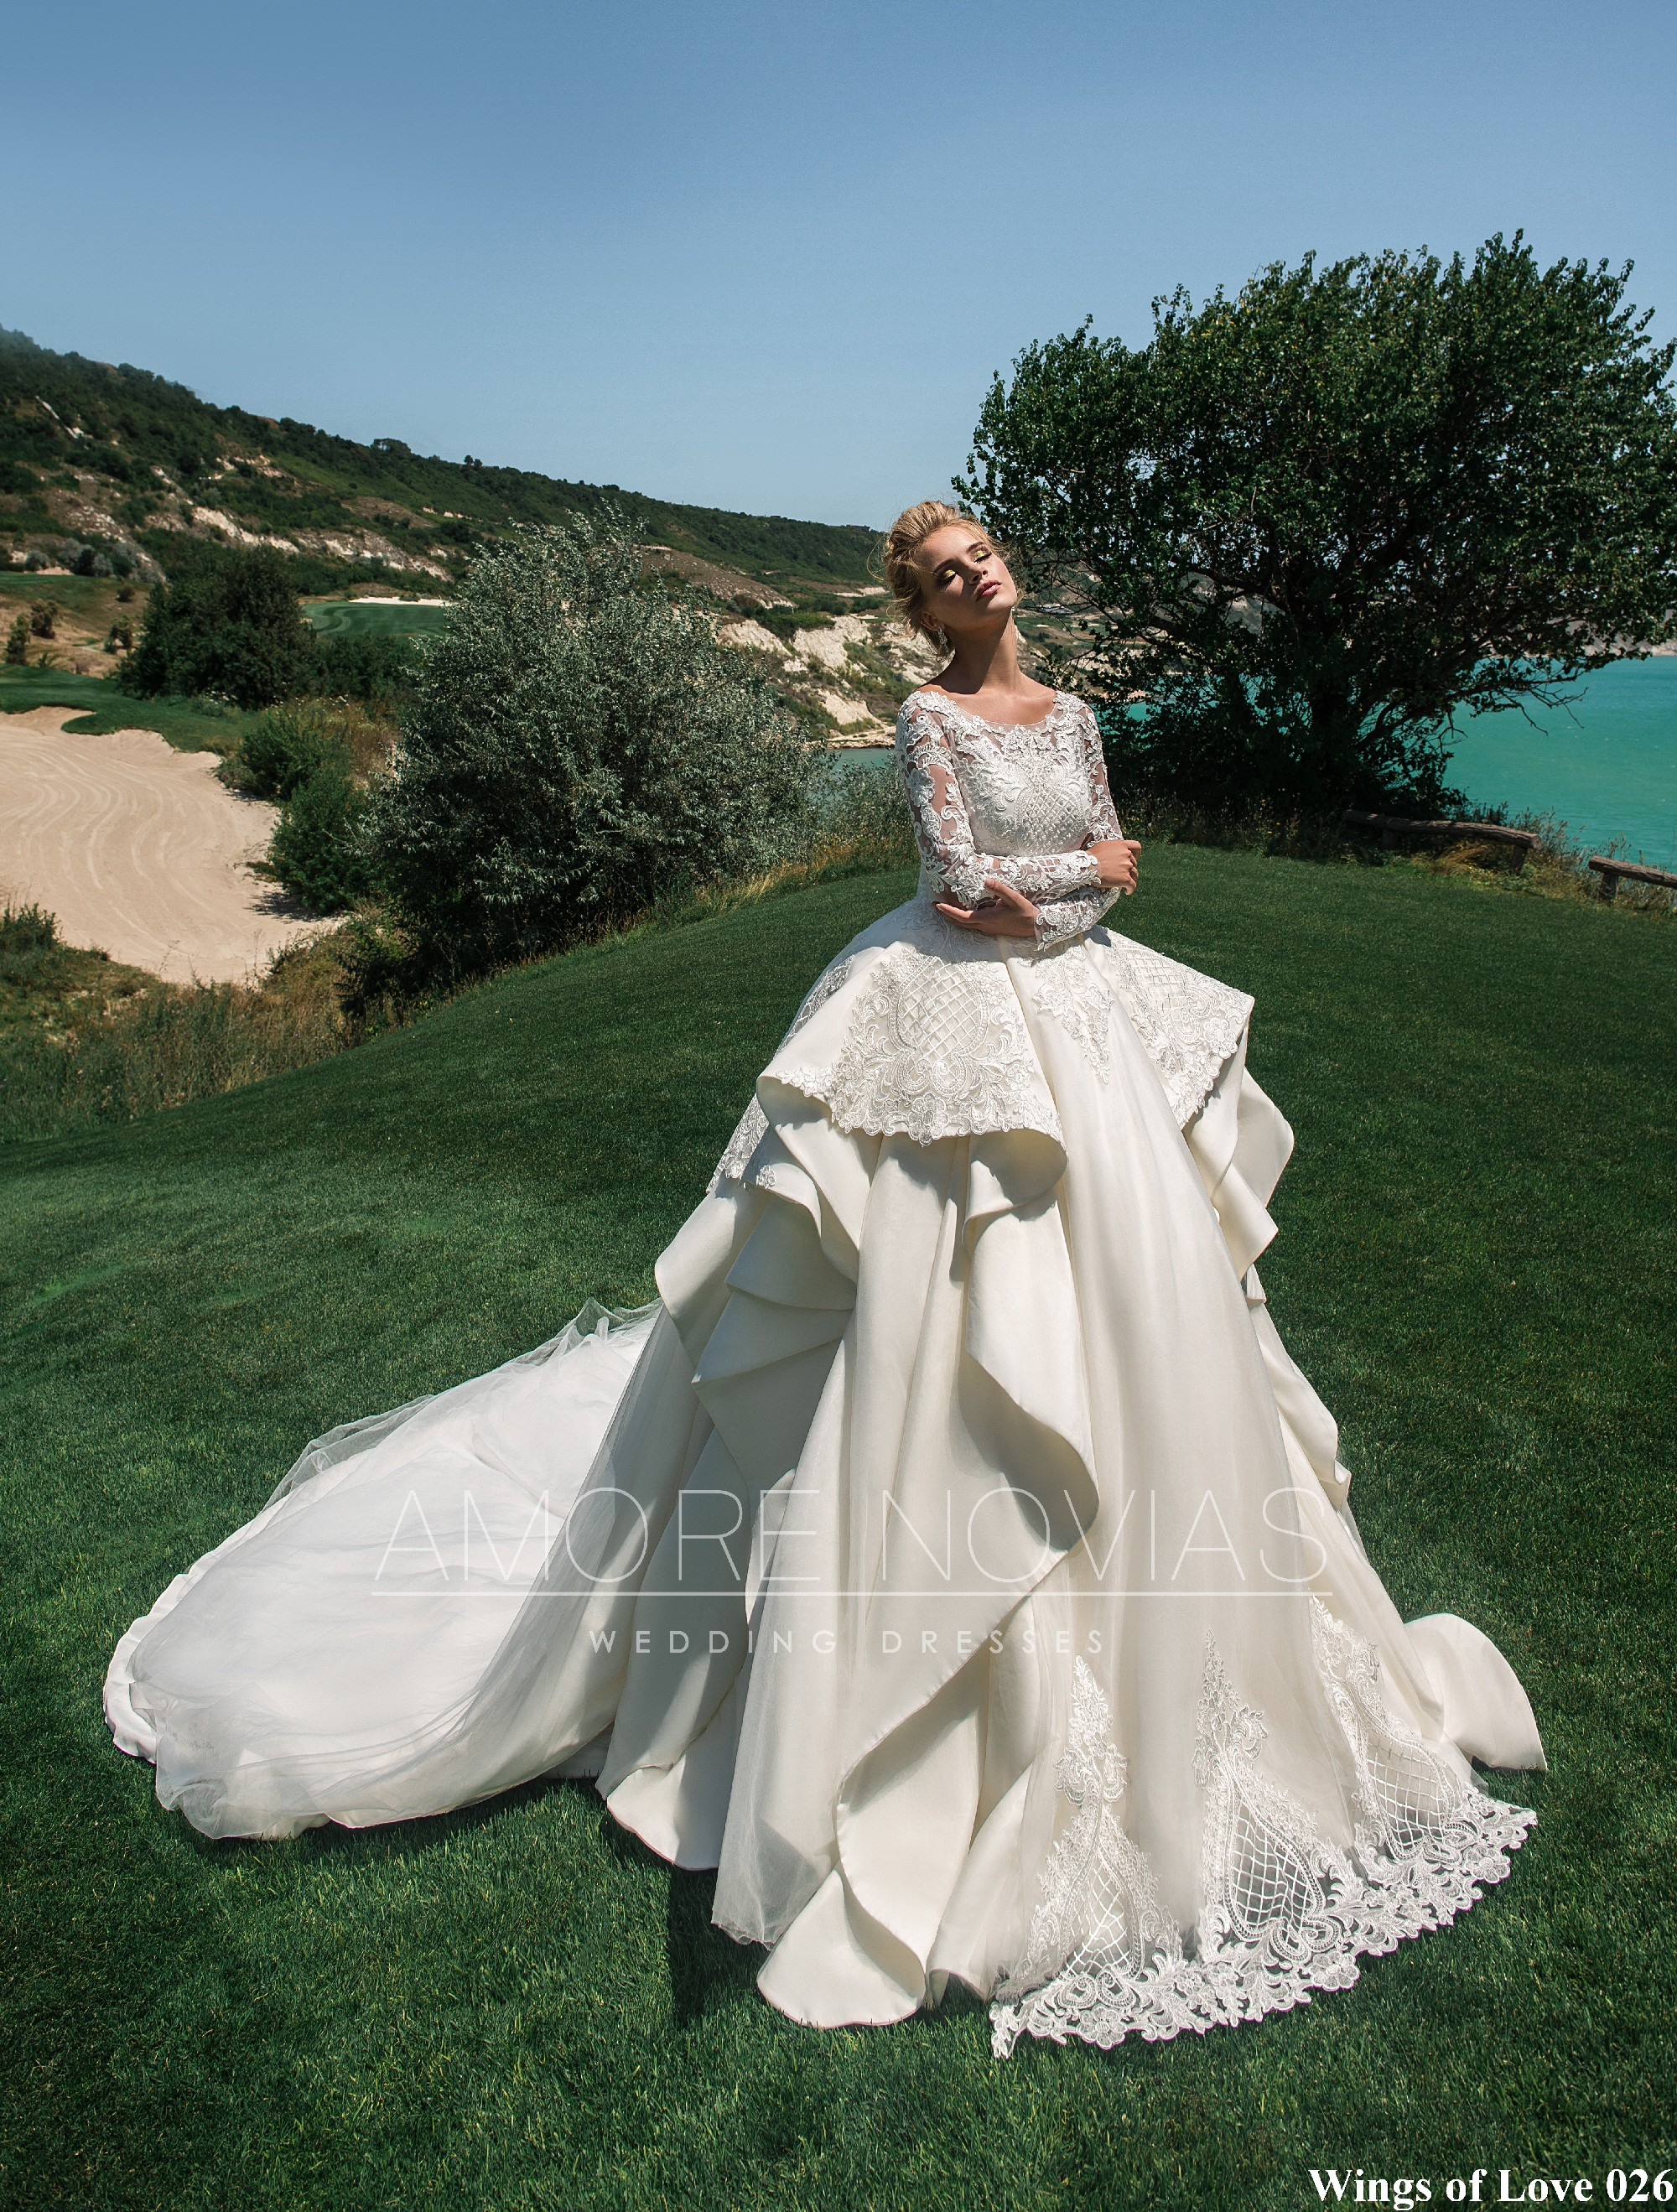 http://amore-novias.com/images/stories/virtuemart/product/lk-026-------(1).jpg